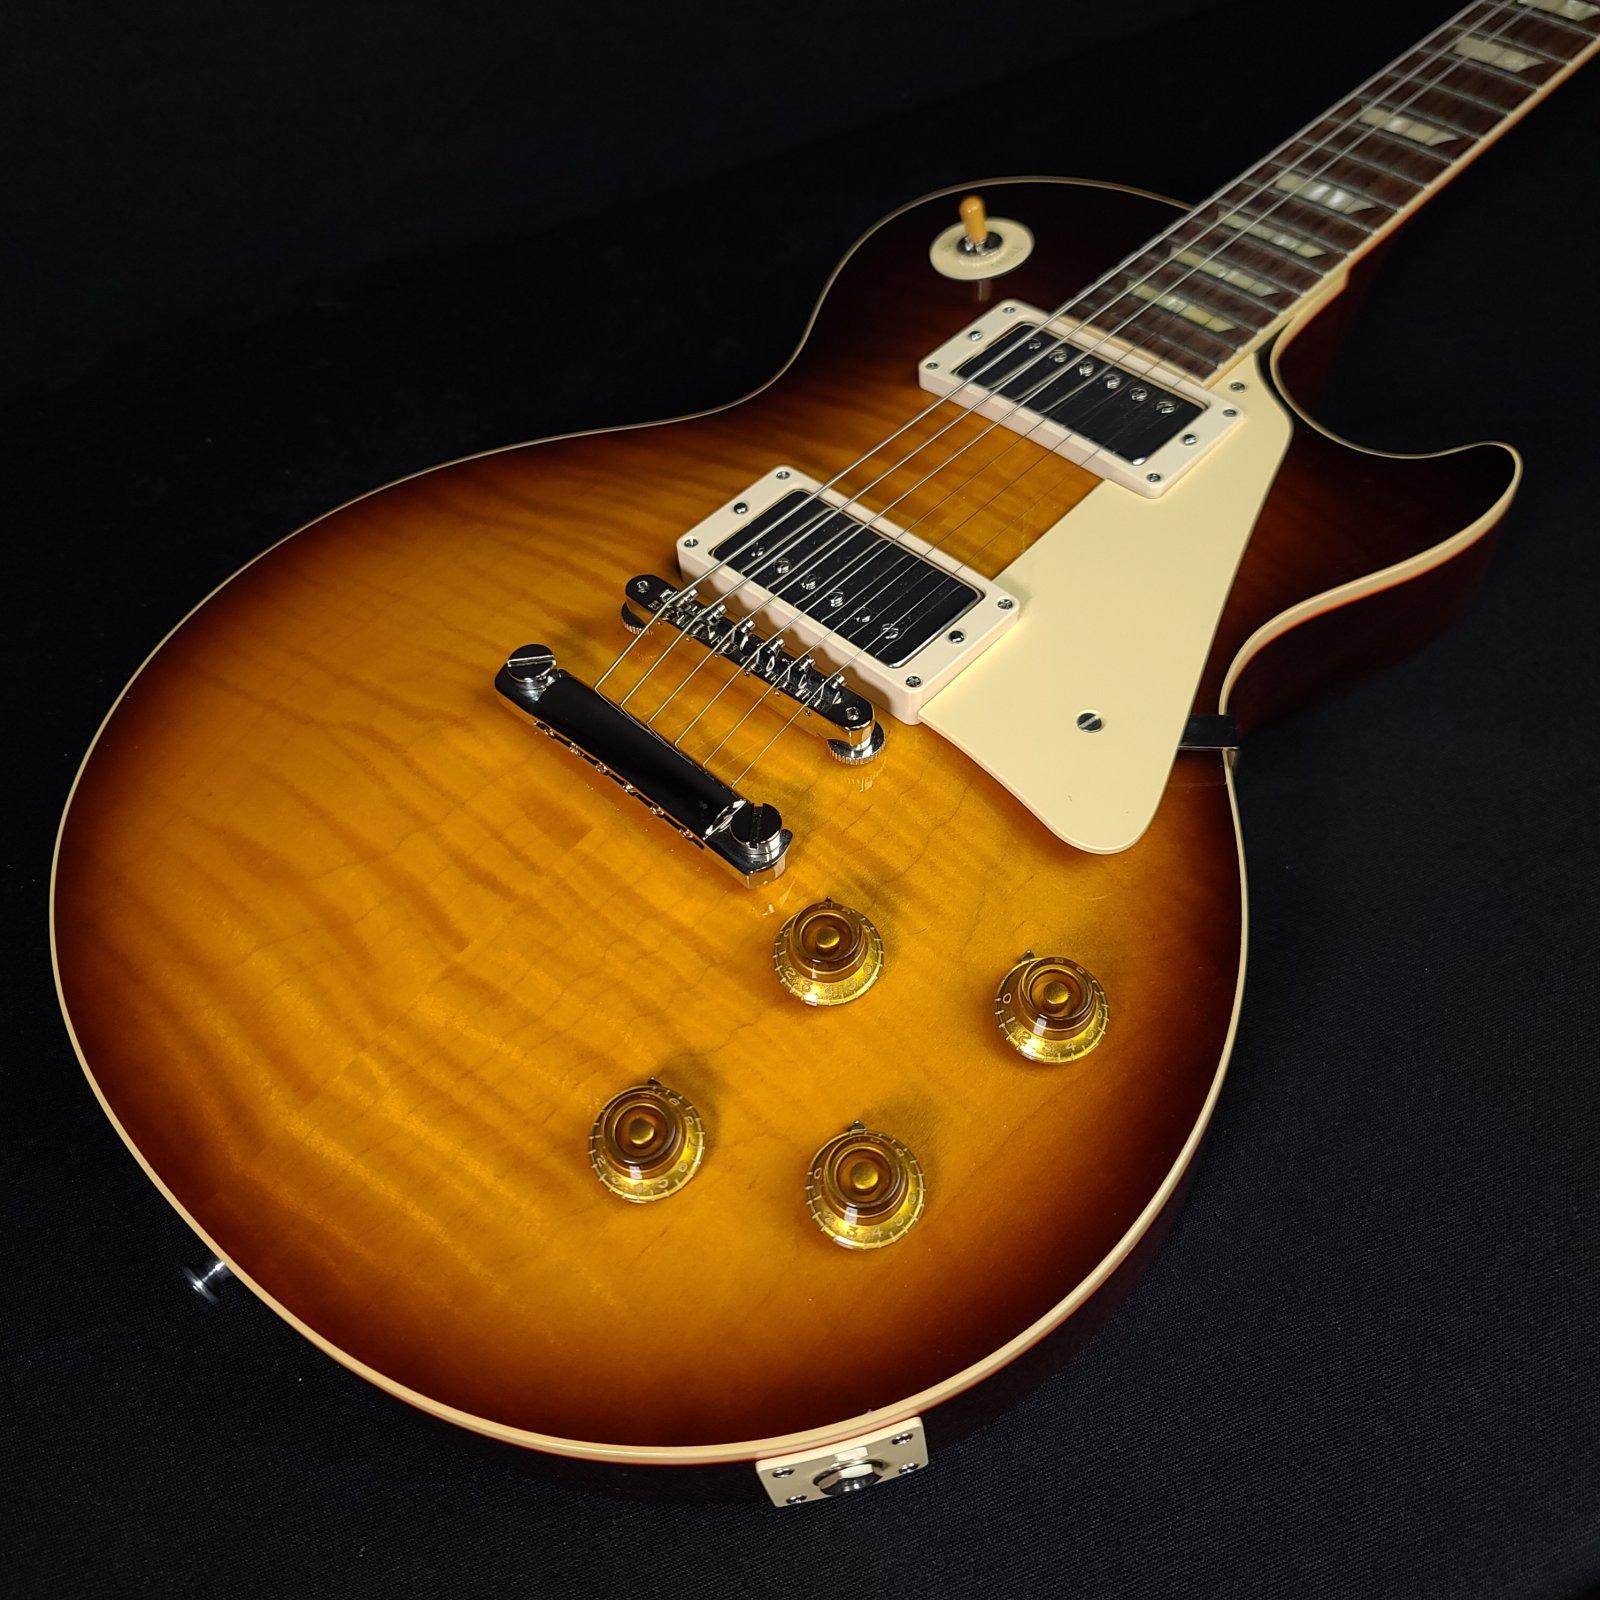 Gibson Les Paul 60th Anniversary 59 Reissue Kindred Burst